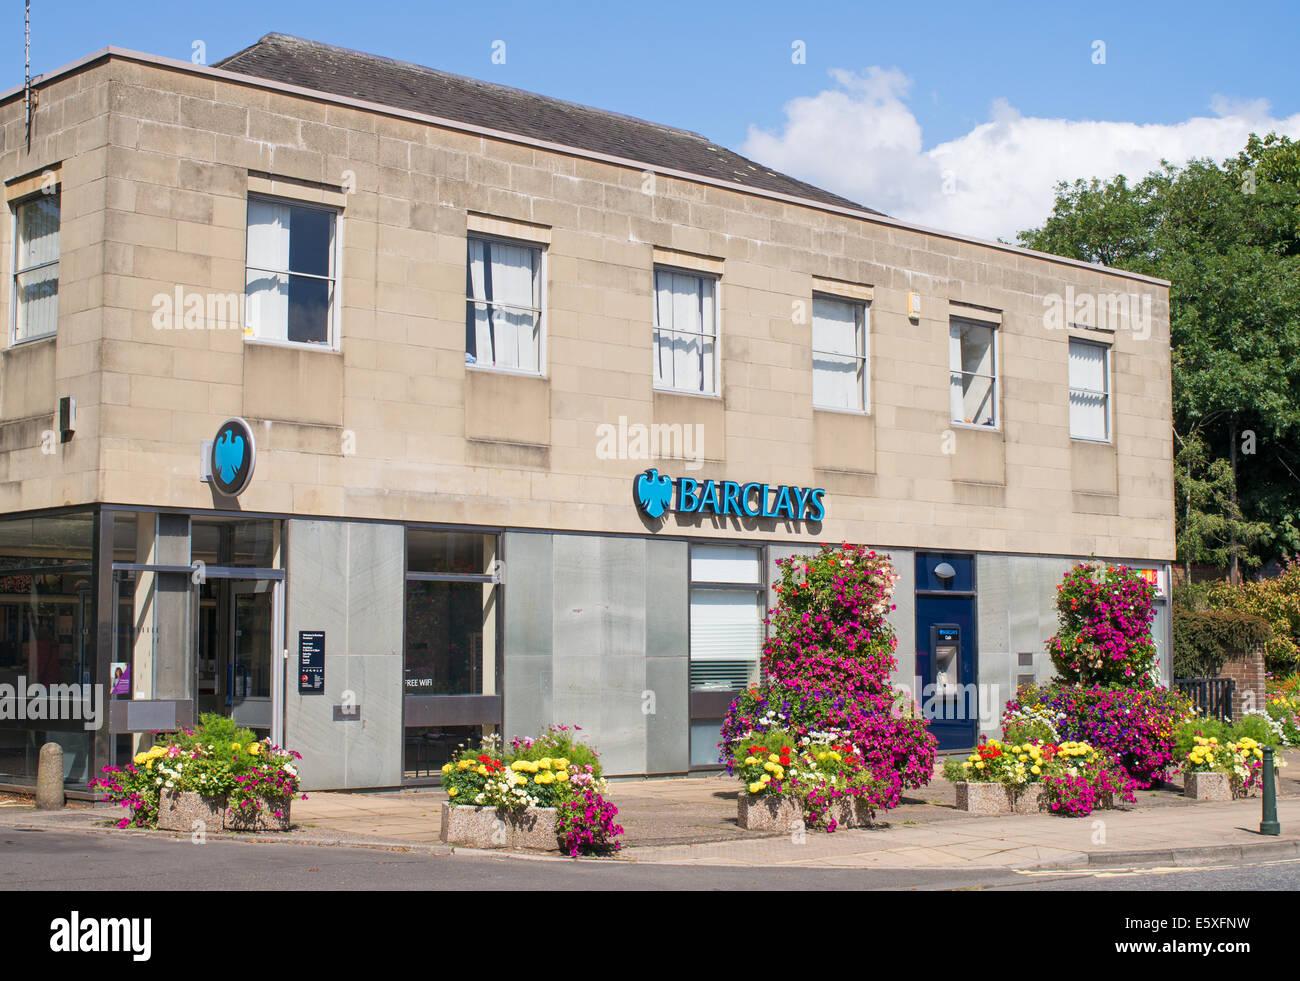 Floral display outside Barclays Bank, Ponteland, Northumberland, north east England, UK - Stock Image